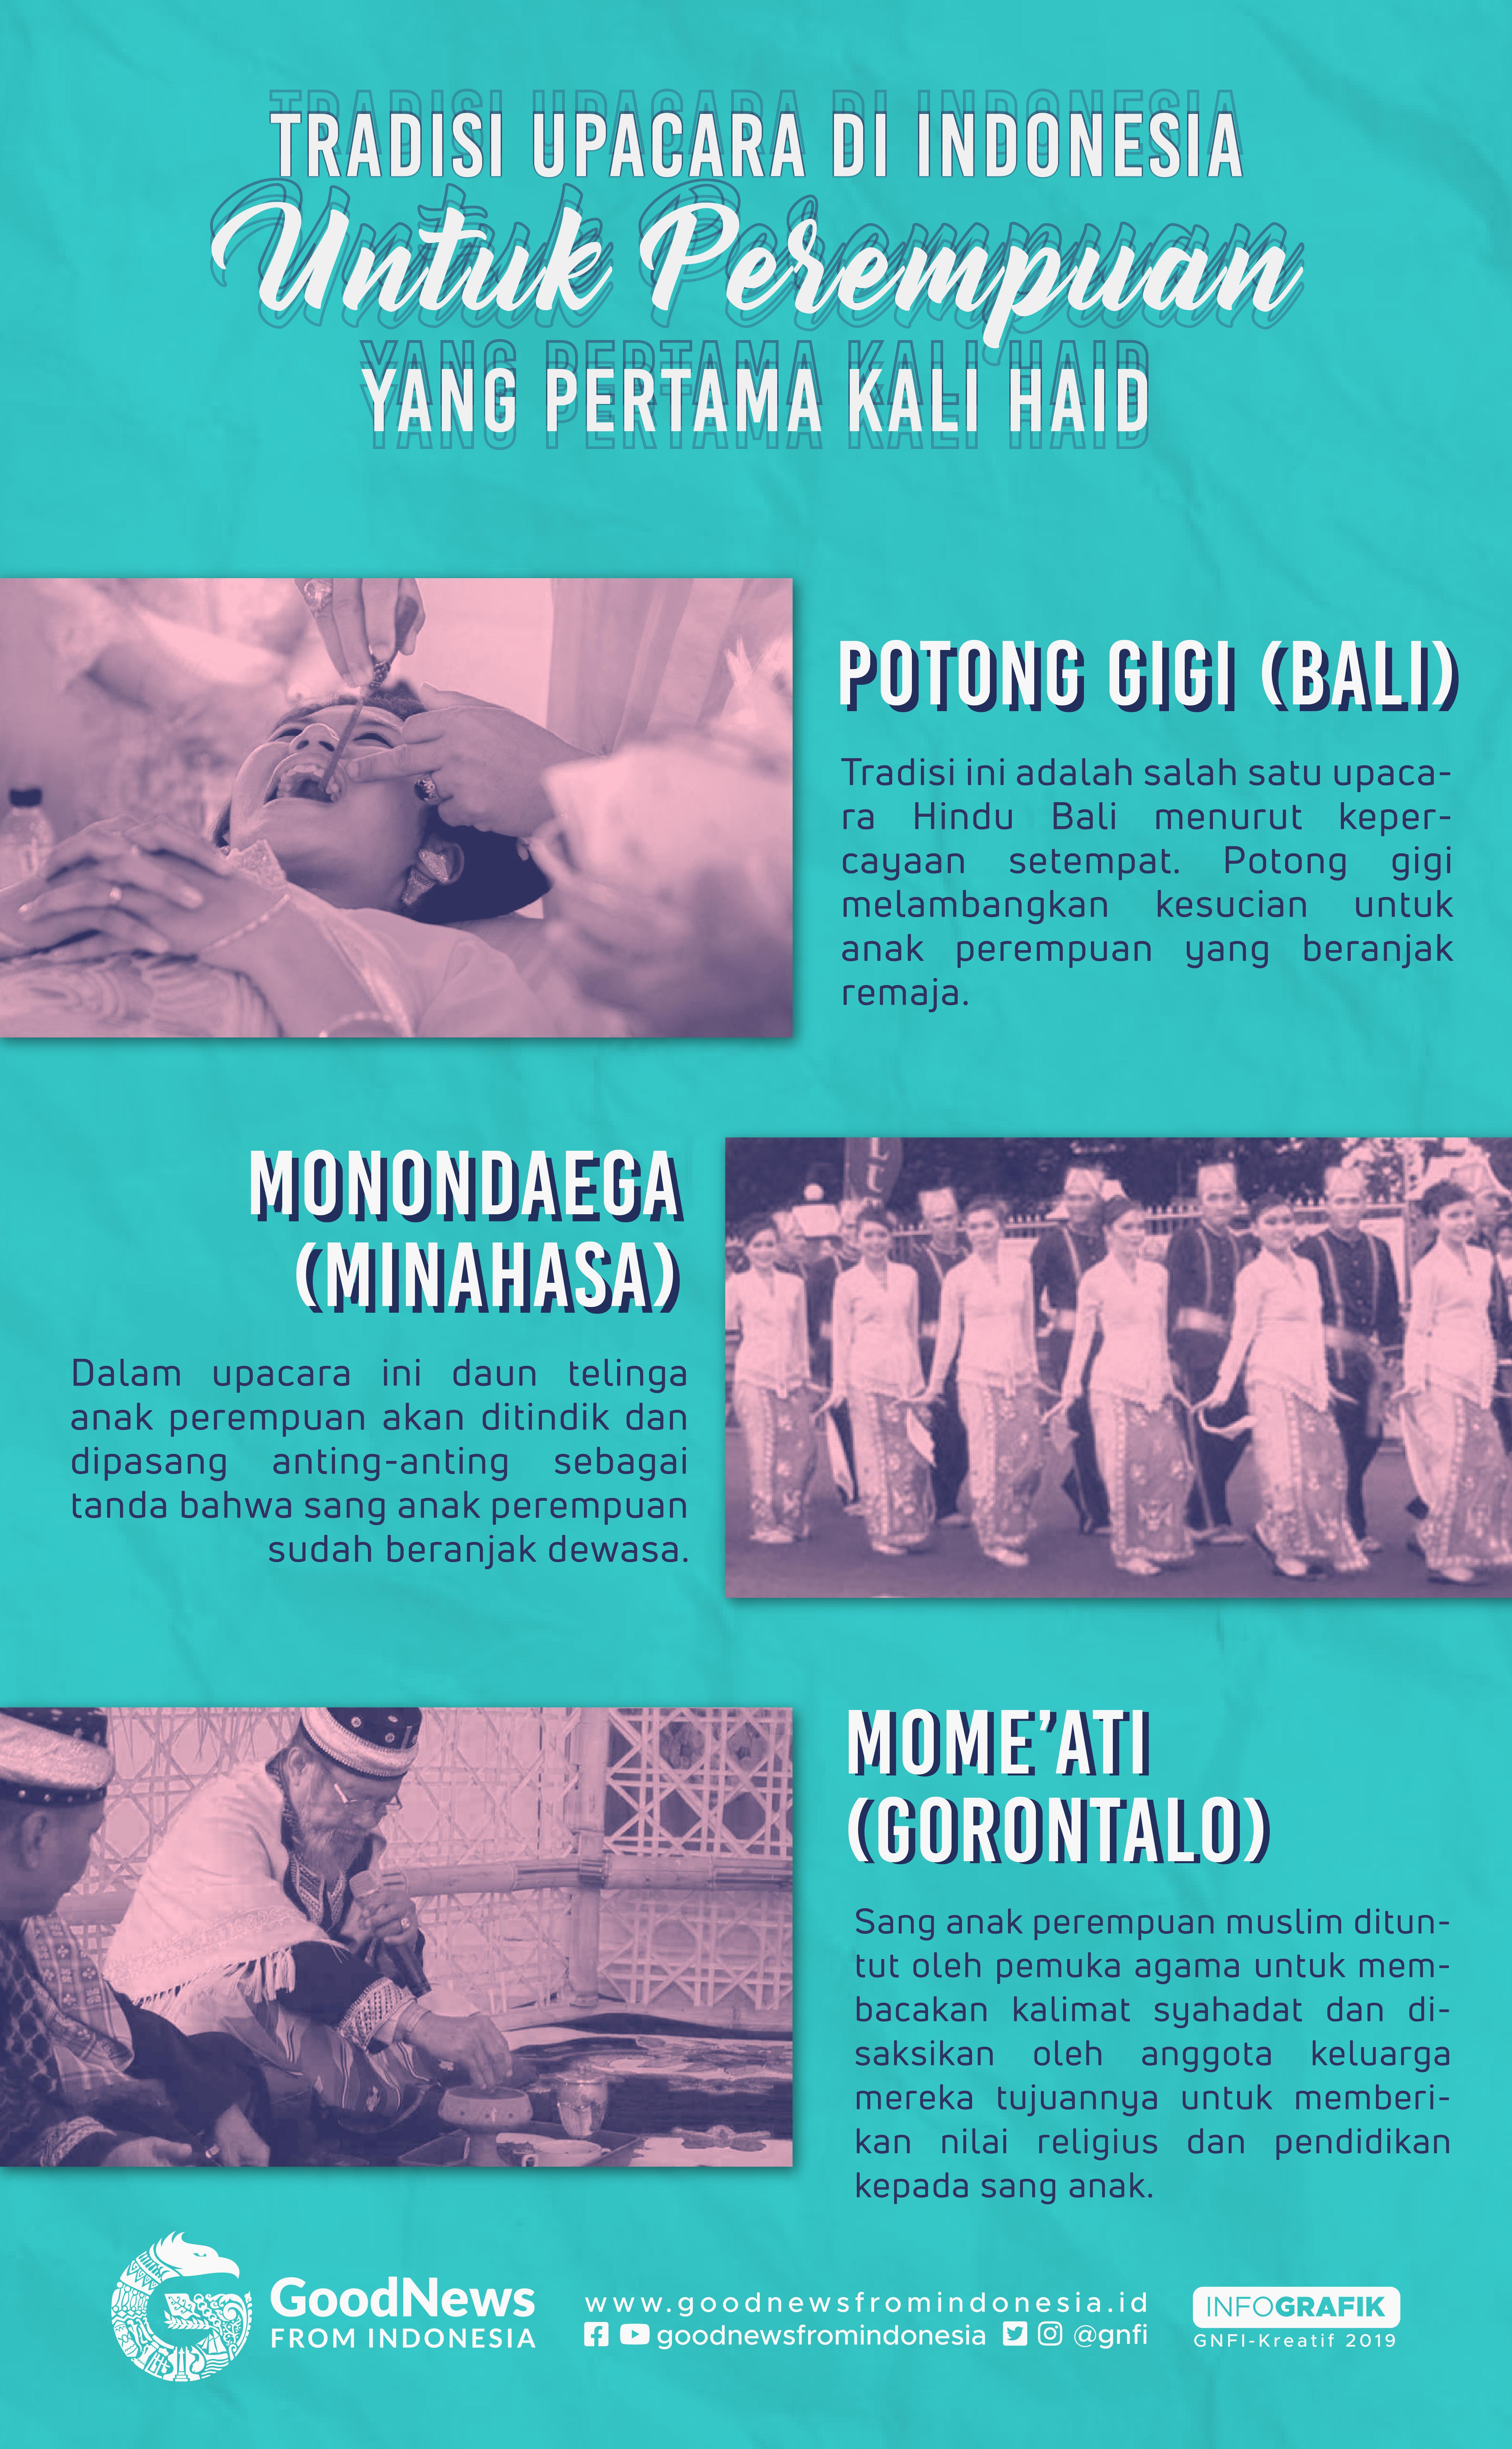 Tradisi Perempuan Haid di Indonesia